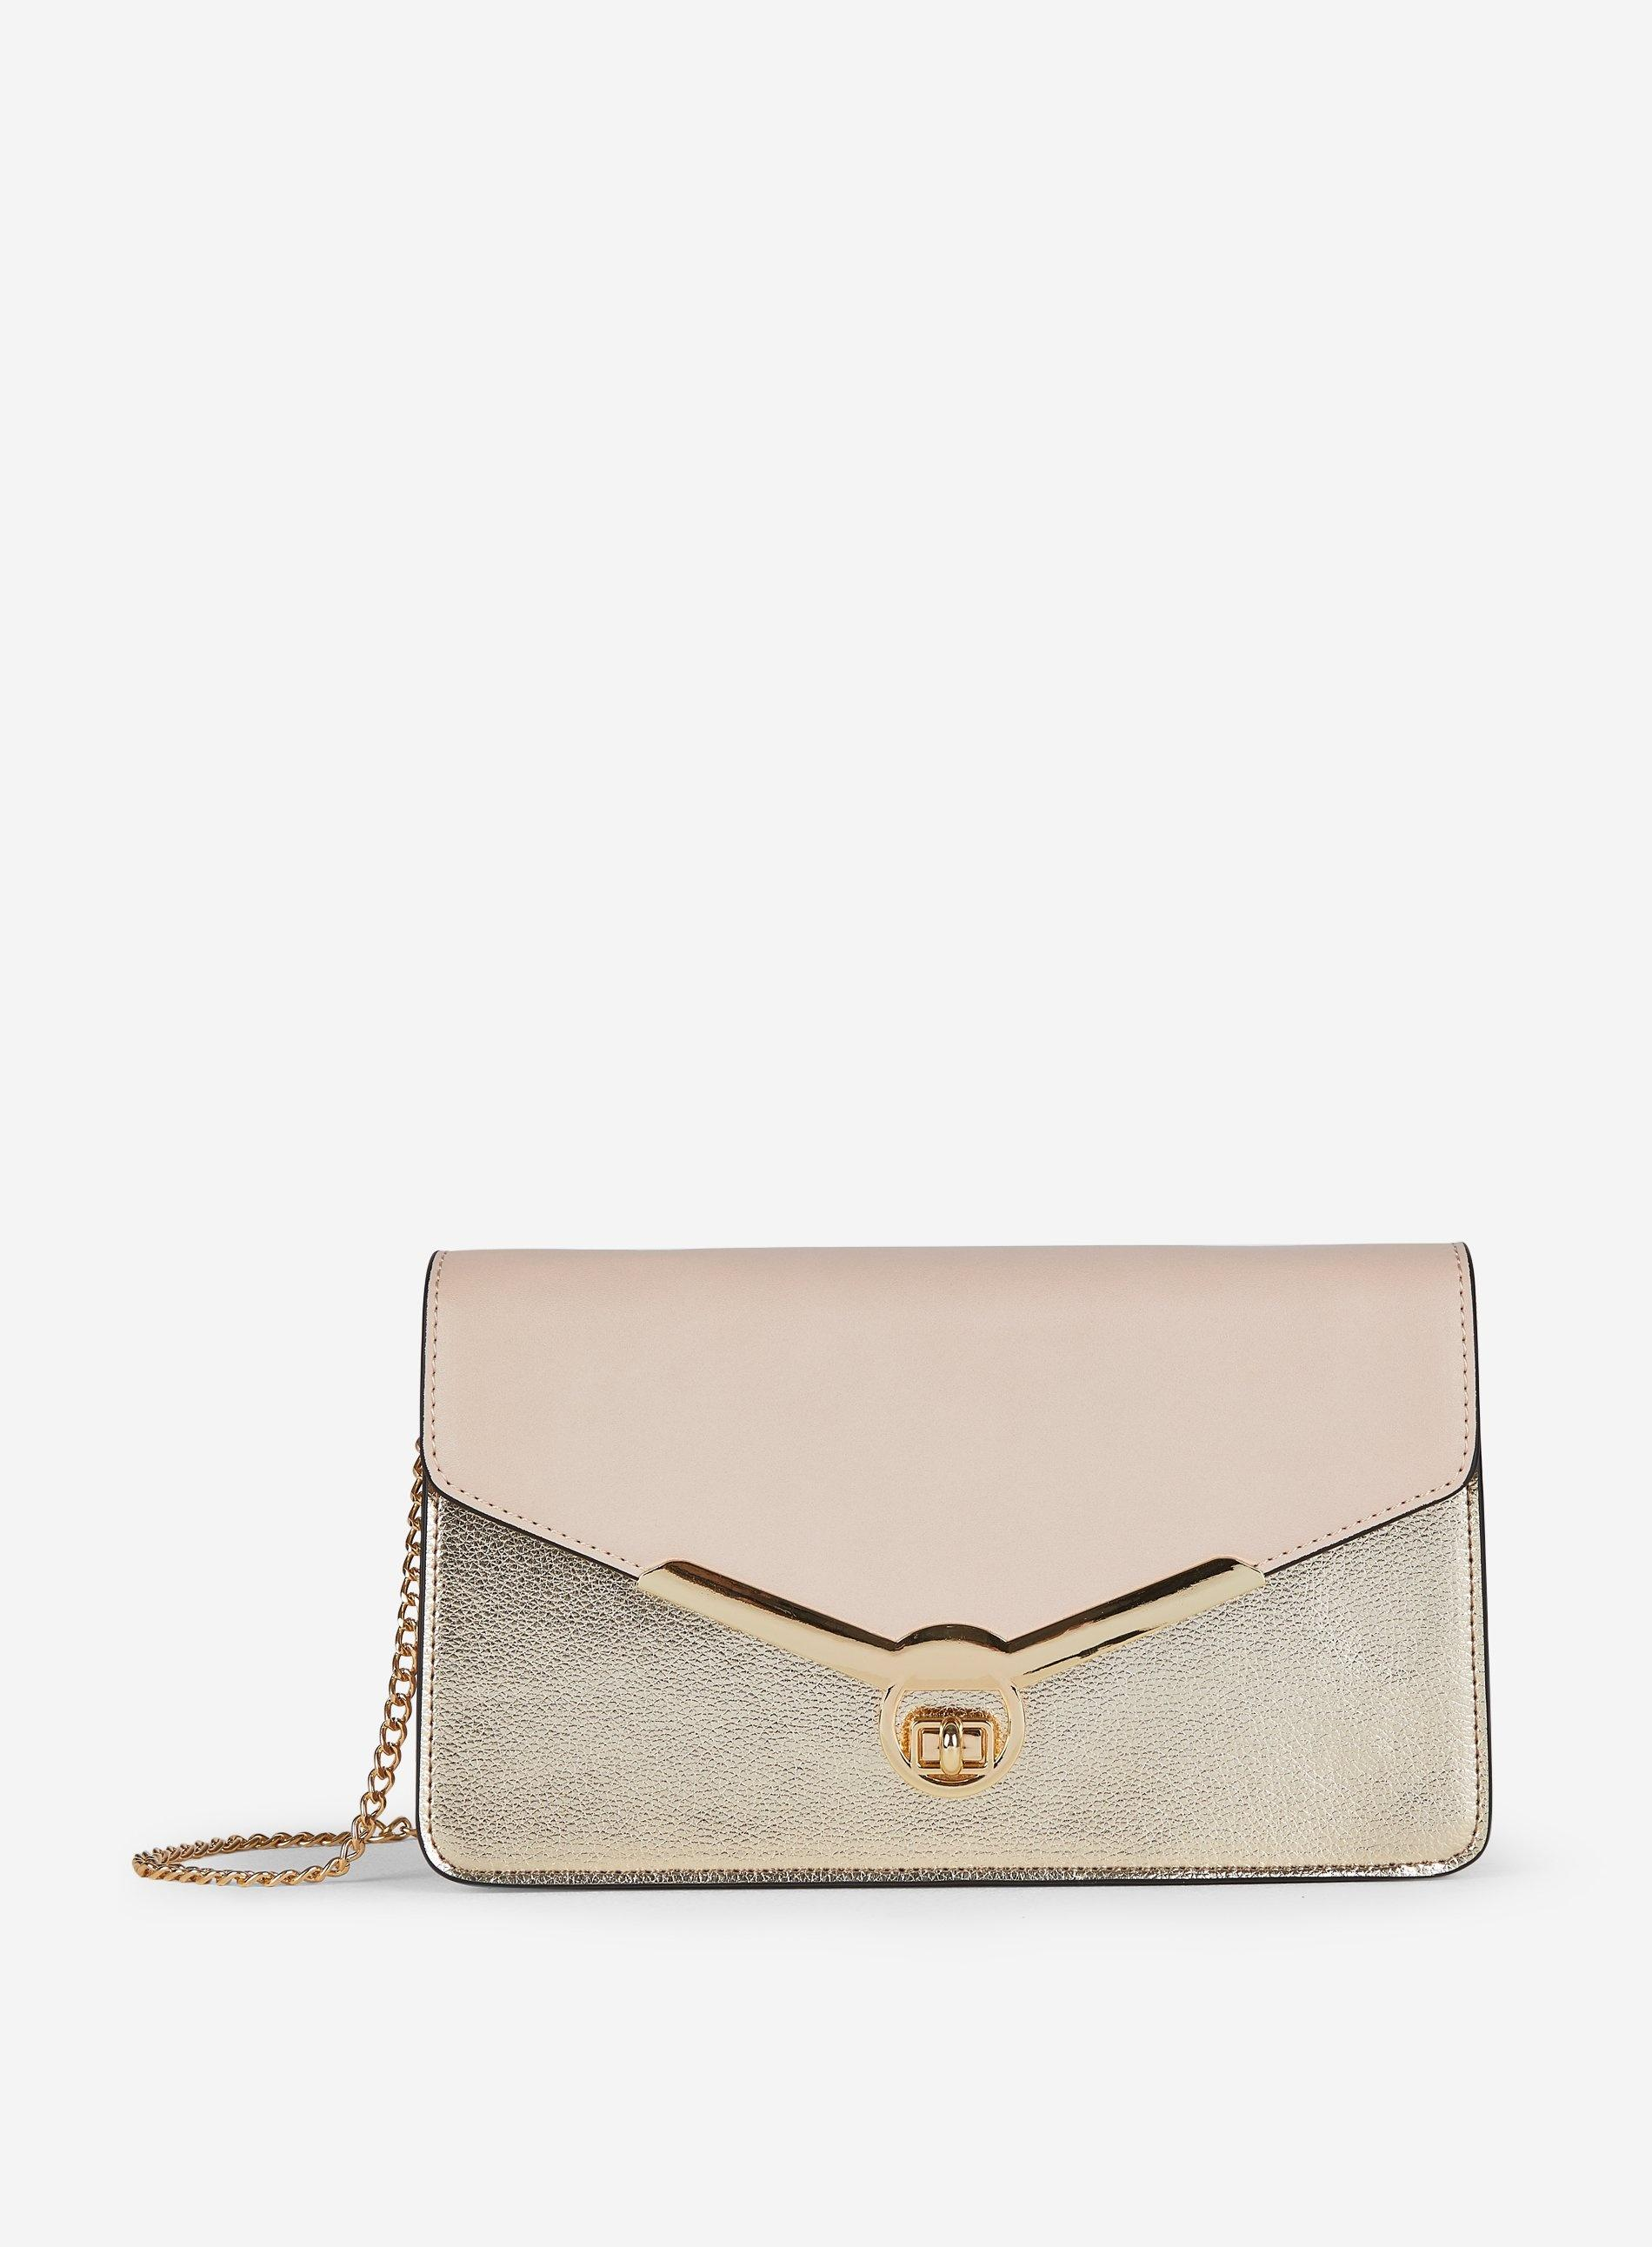 18c2a870383 Dorothy Perkins Gold Twistlock Clutch Bag in White - Lyst